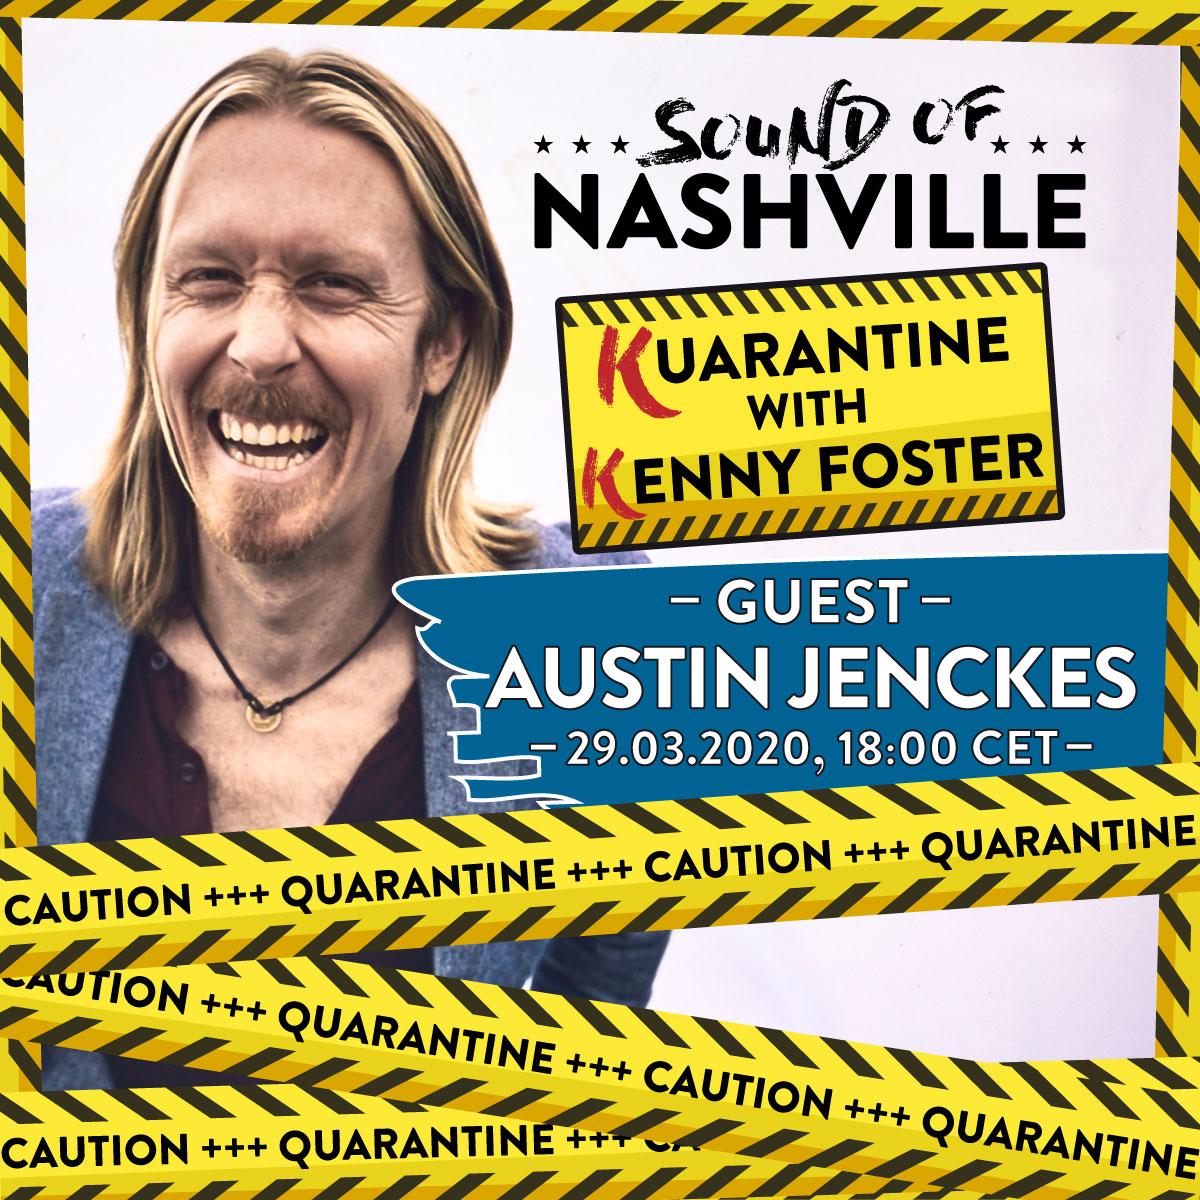 announcemnet_quarantine_with_Kenny_guest_Austin-Jenckes_SON_1200x1200